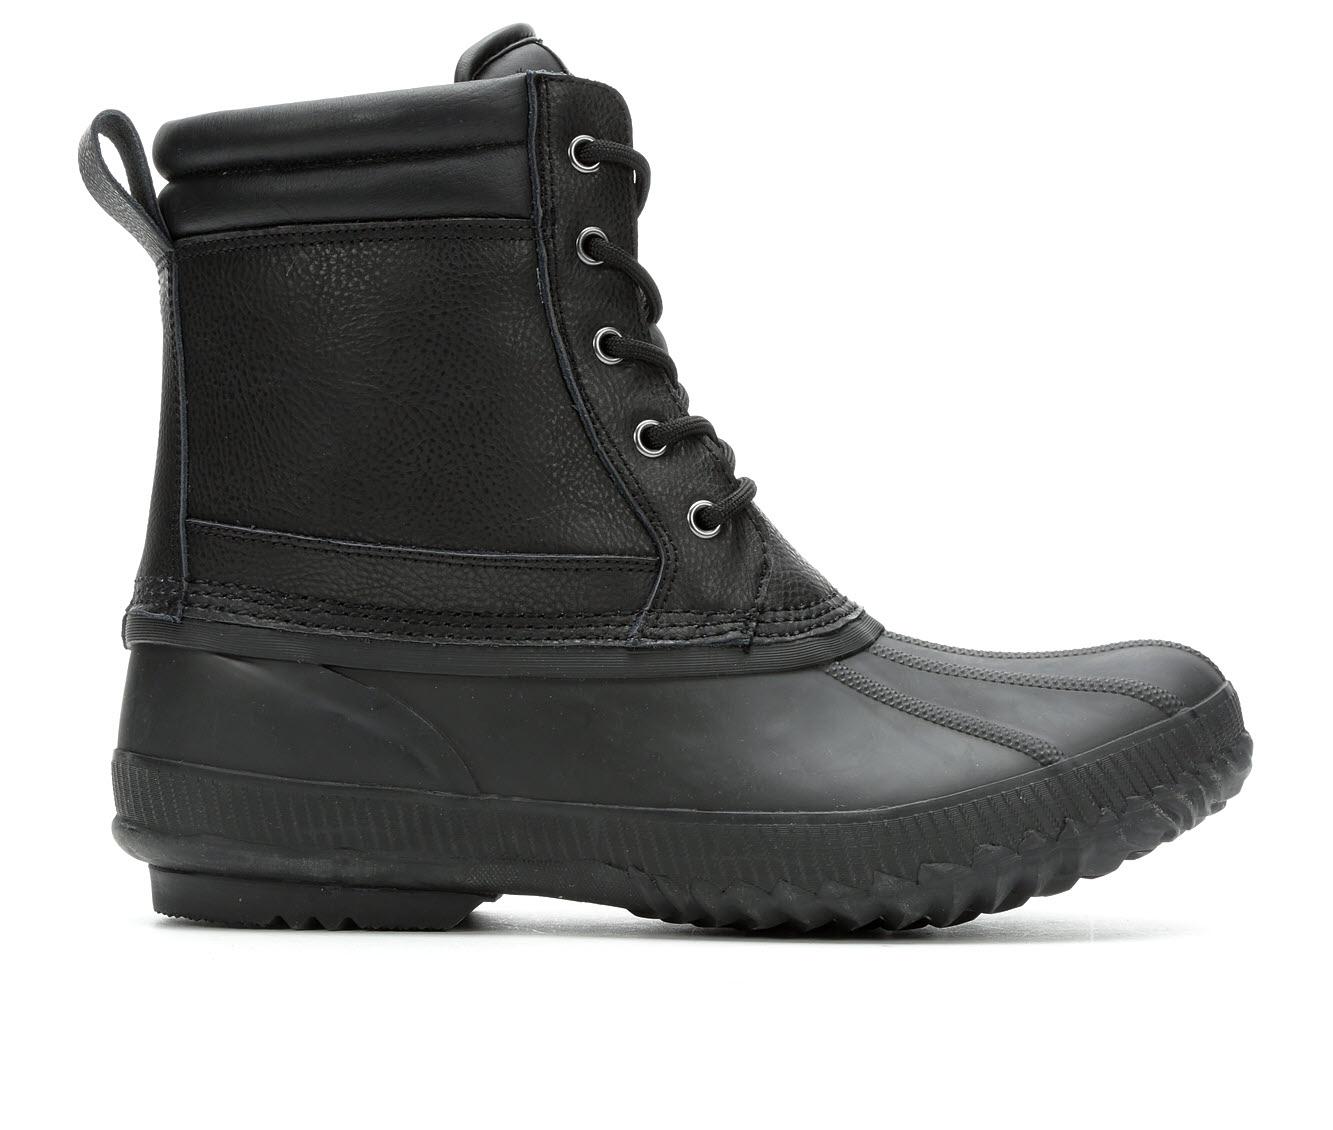 London Fog Sheiffield Men's Boots (Black Leather)